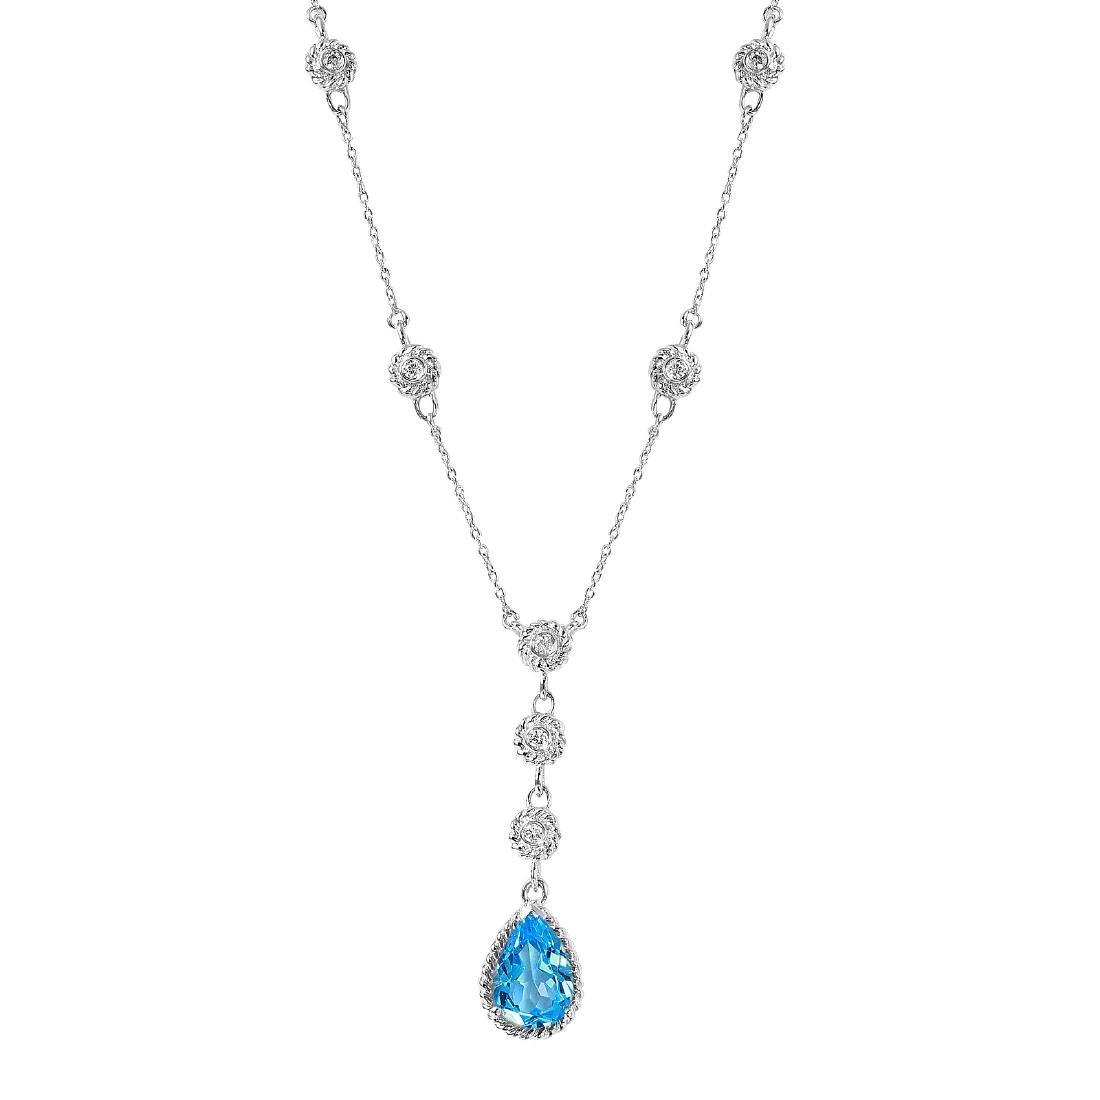 14KT White Gold 2.14ctw Topaz Diamond Necklace Length